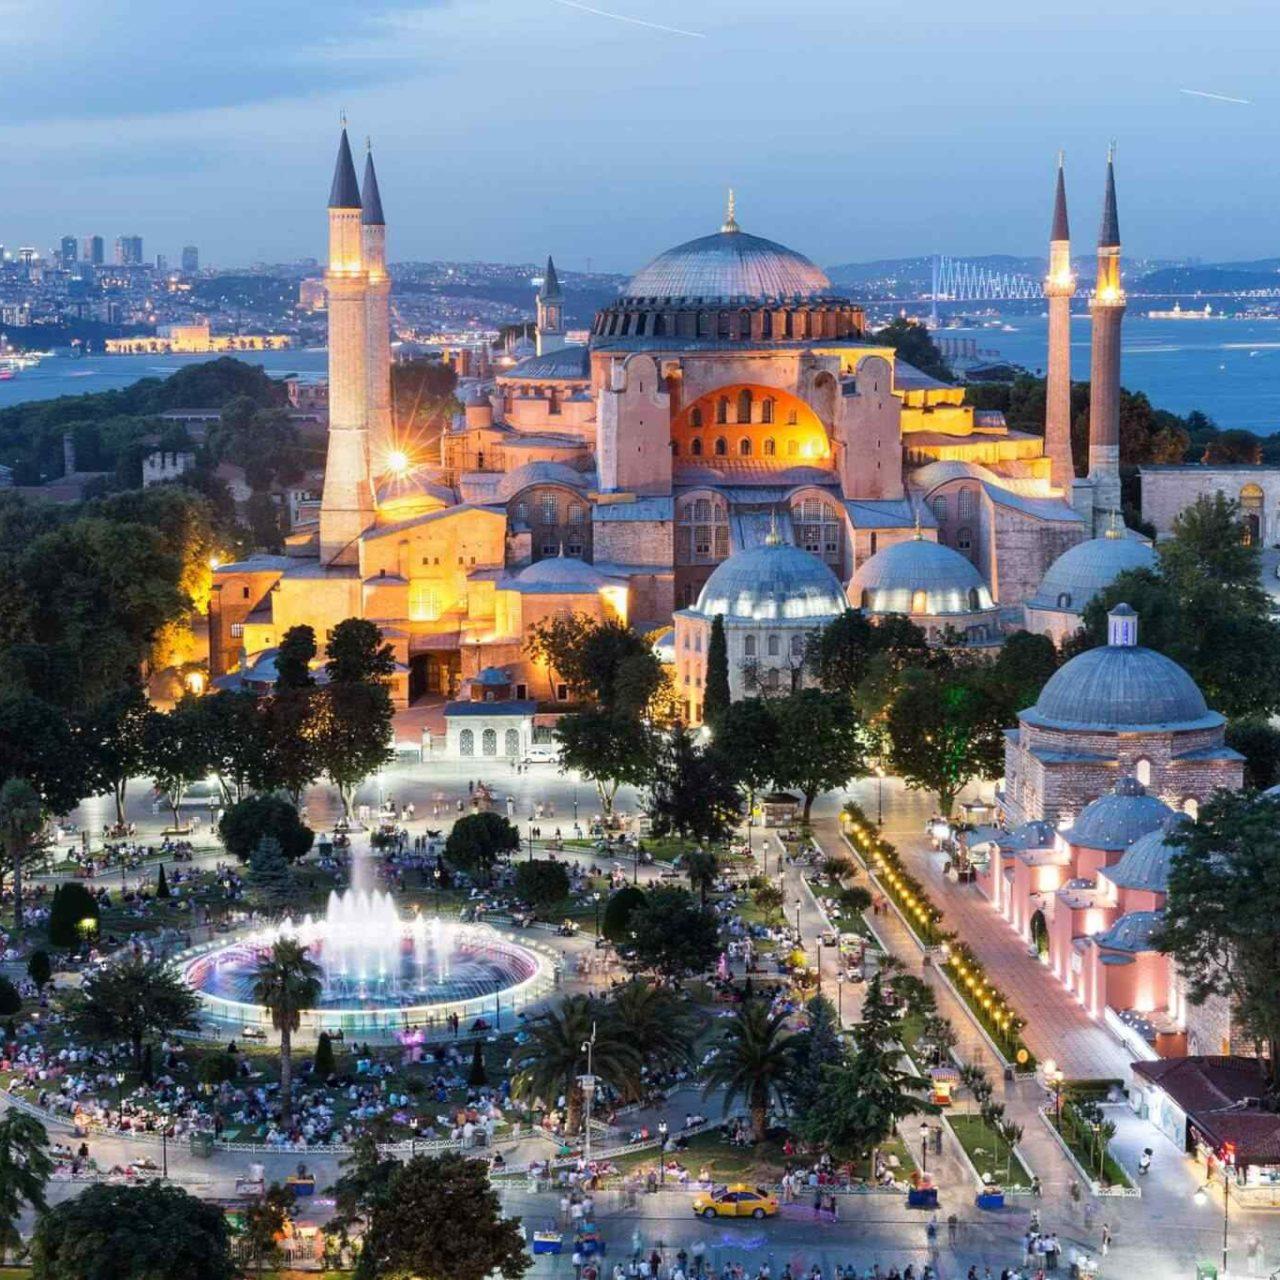 https://www.banitours.com/wp-content/uploads/2018/09/destination-istanbul-02-1280x1280.jpg